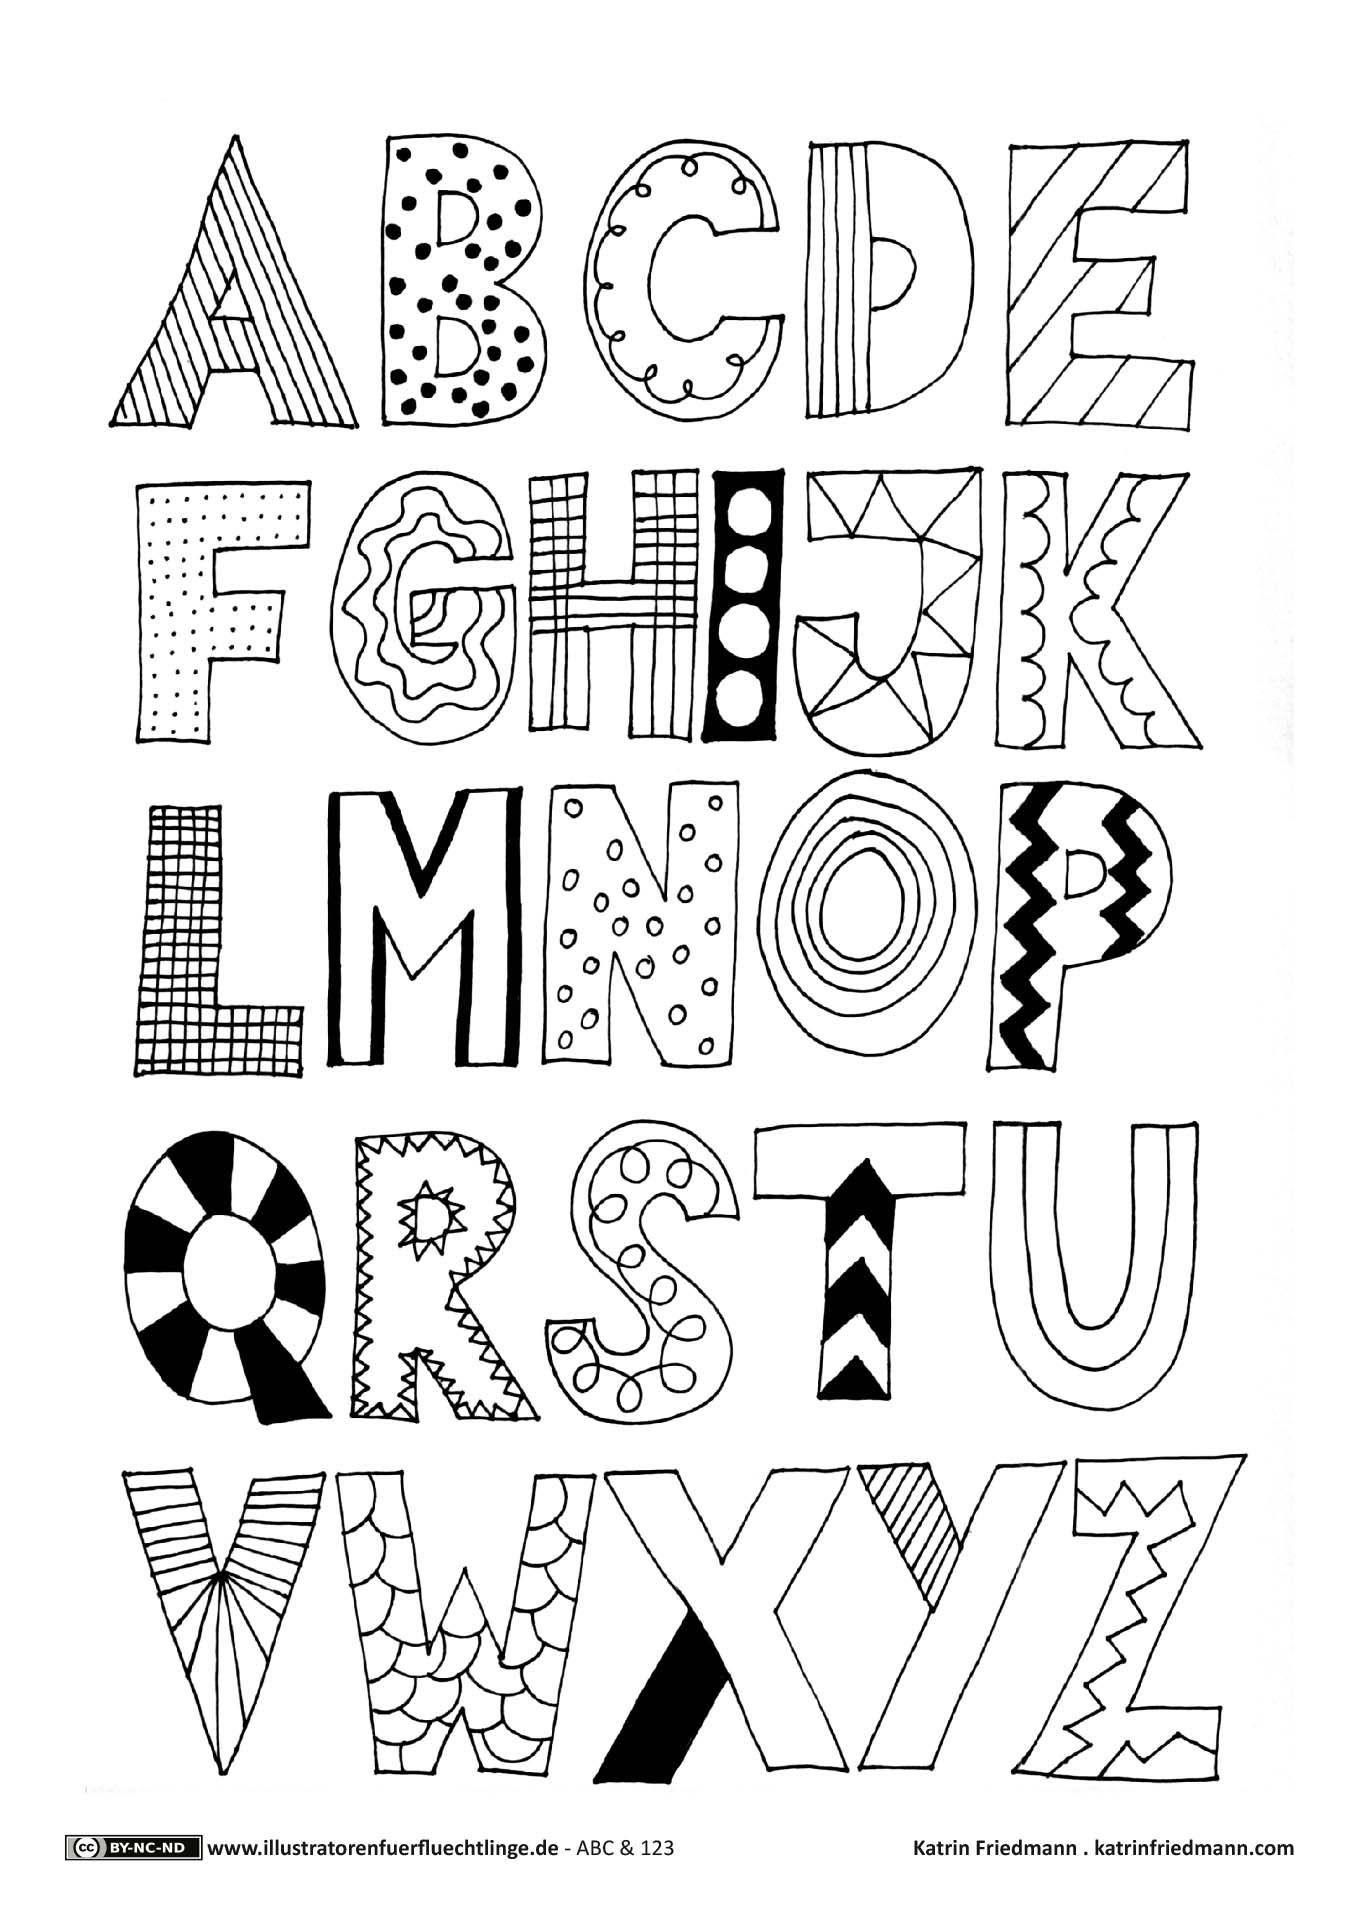 Download Als Pdf Abc Und 123 Abc Friedmann Hand Lettering